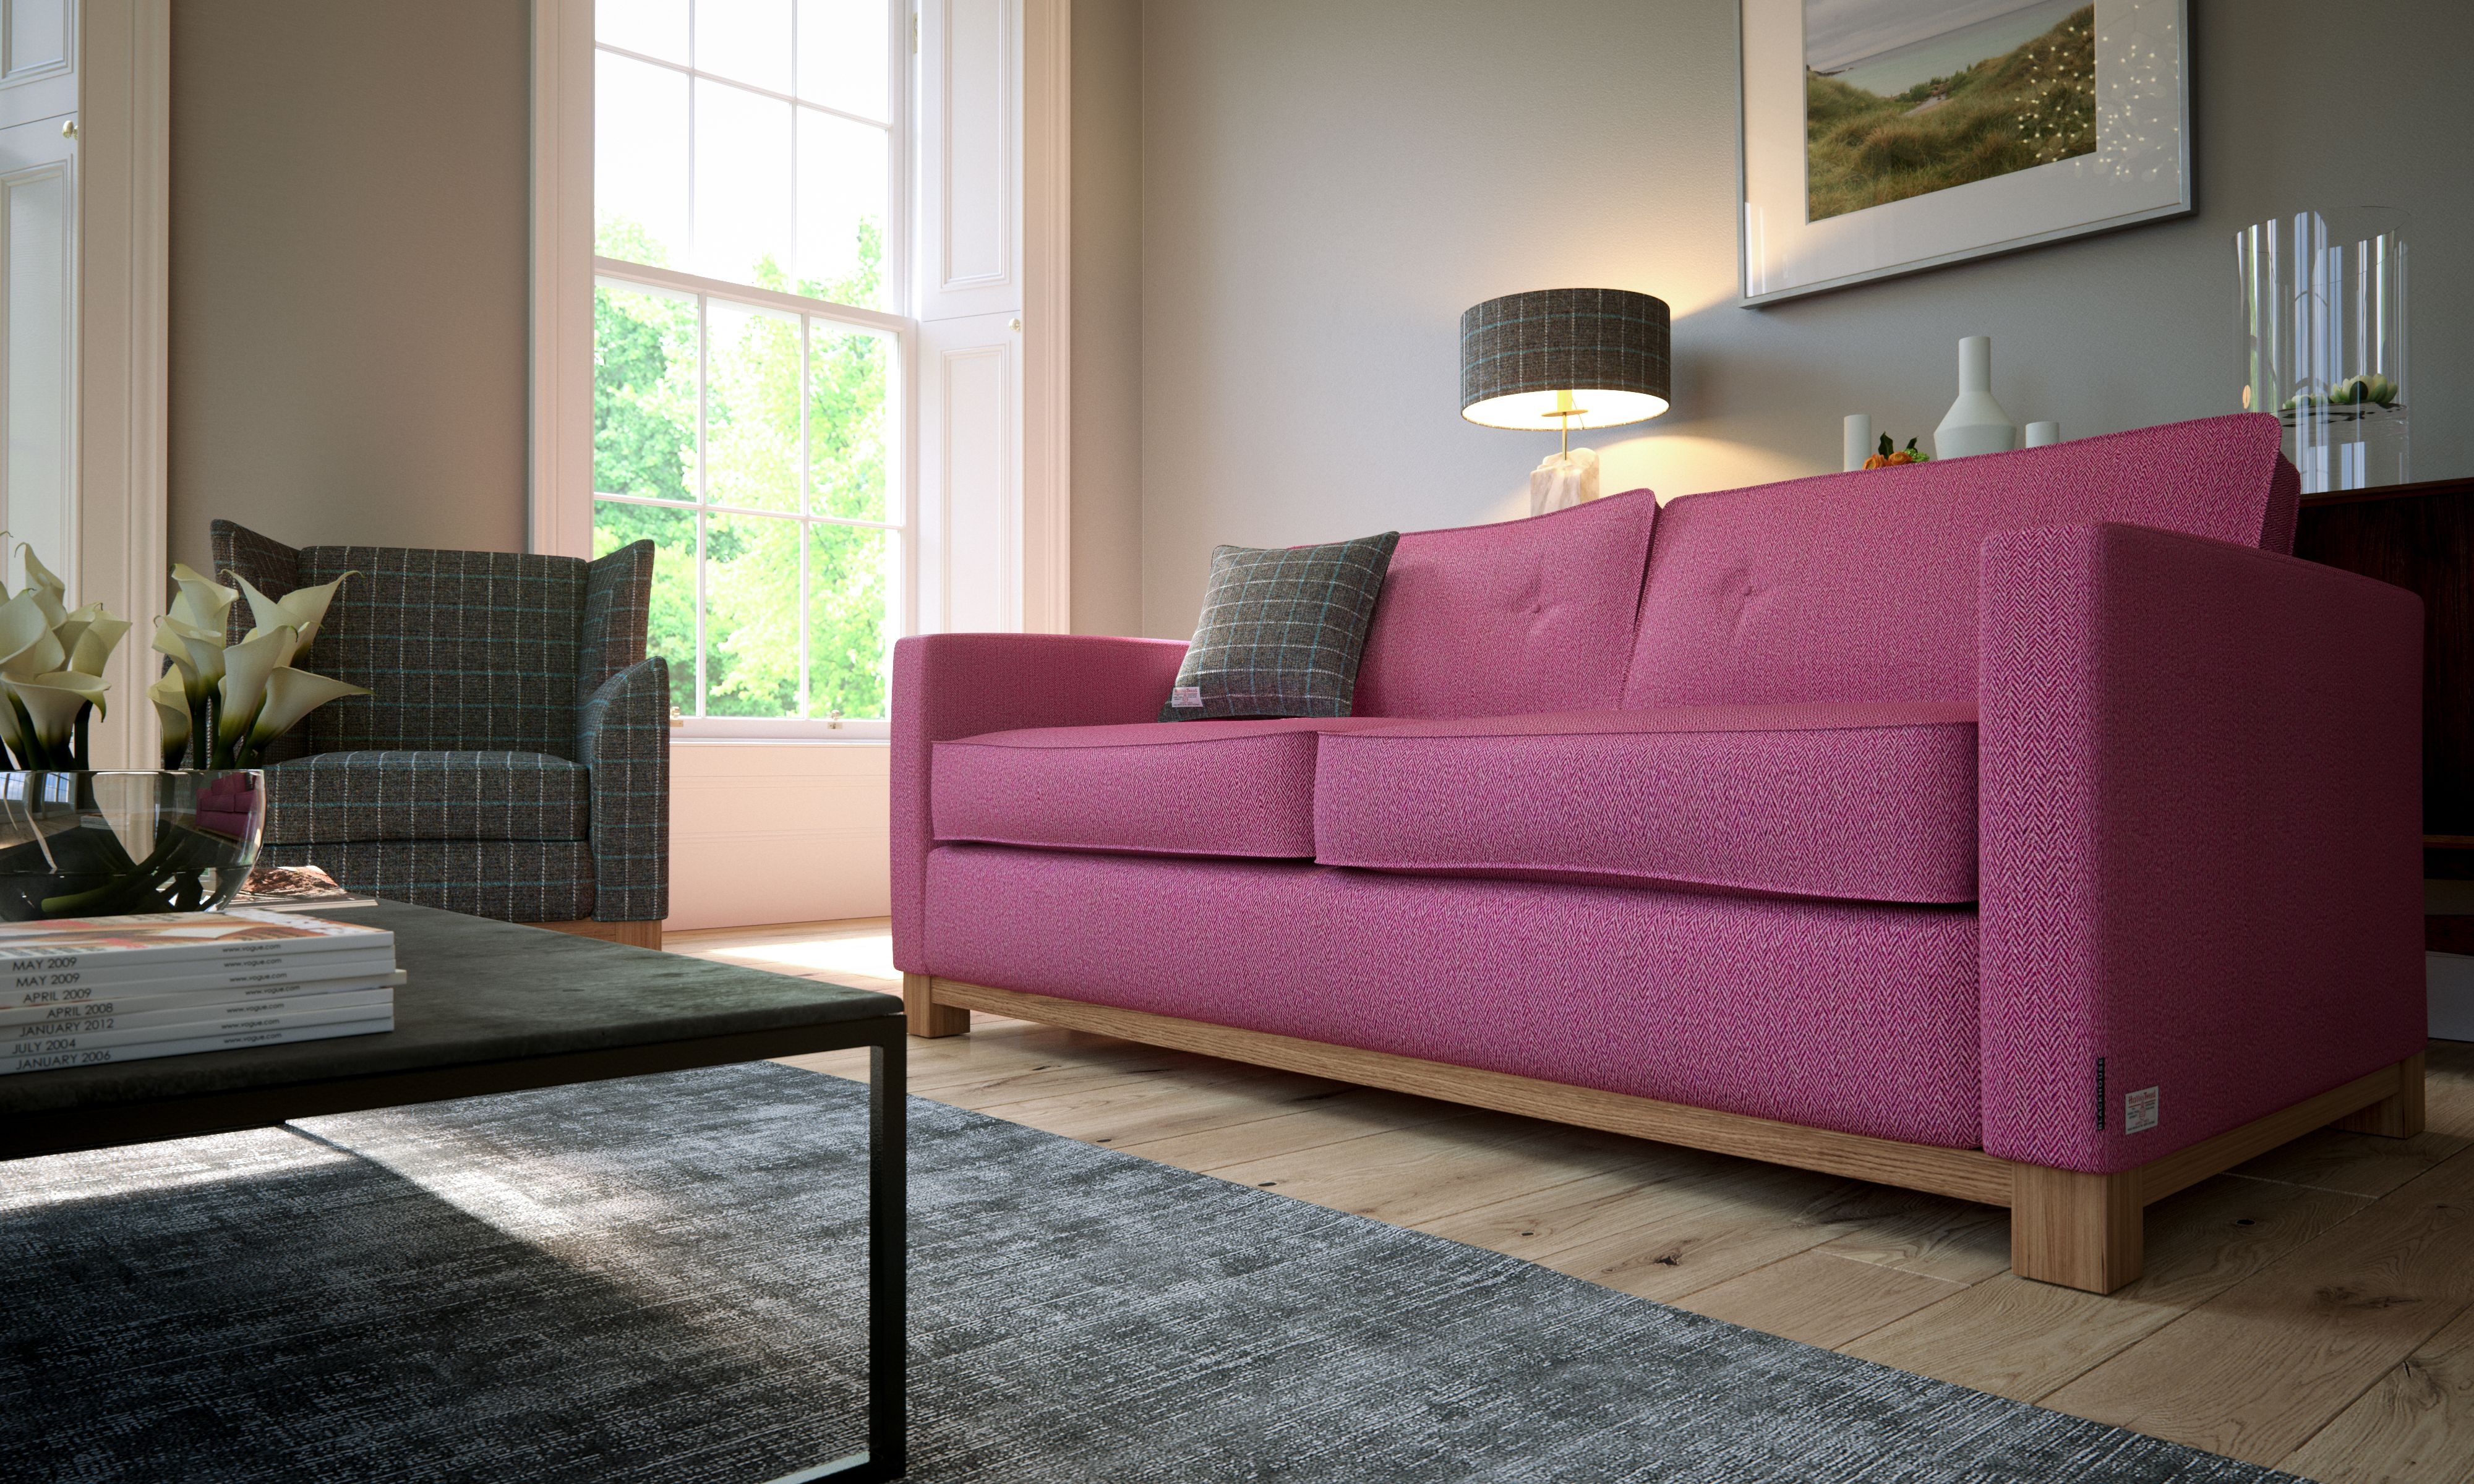 Attrayant The Blackhouse Waverley Sofa In The Stunning Plum Herringbone Harris Tweed.